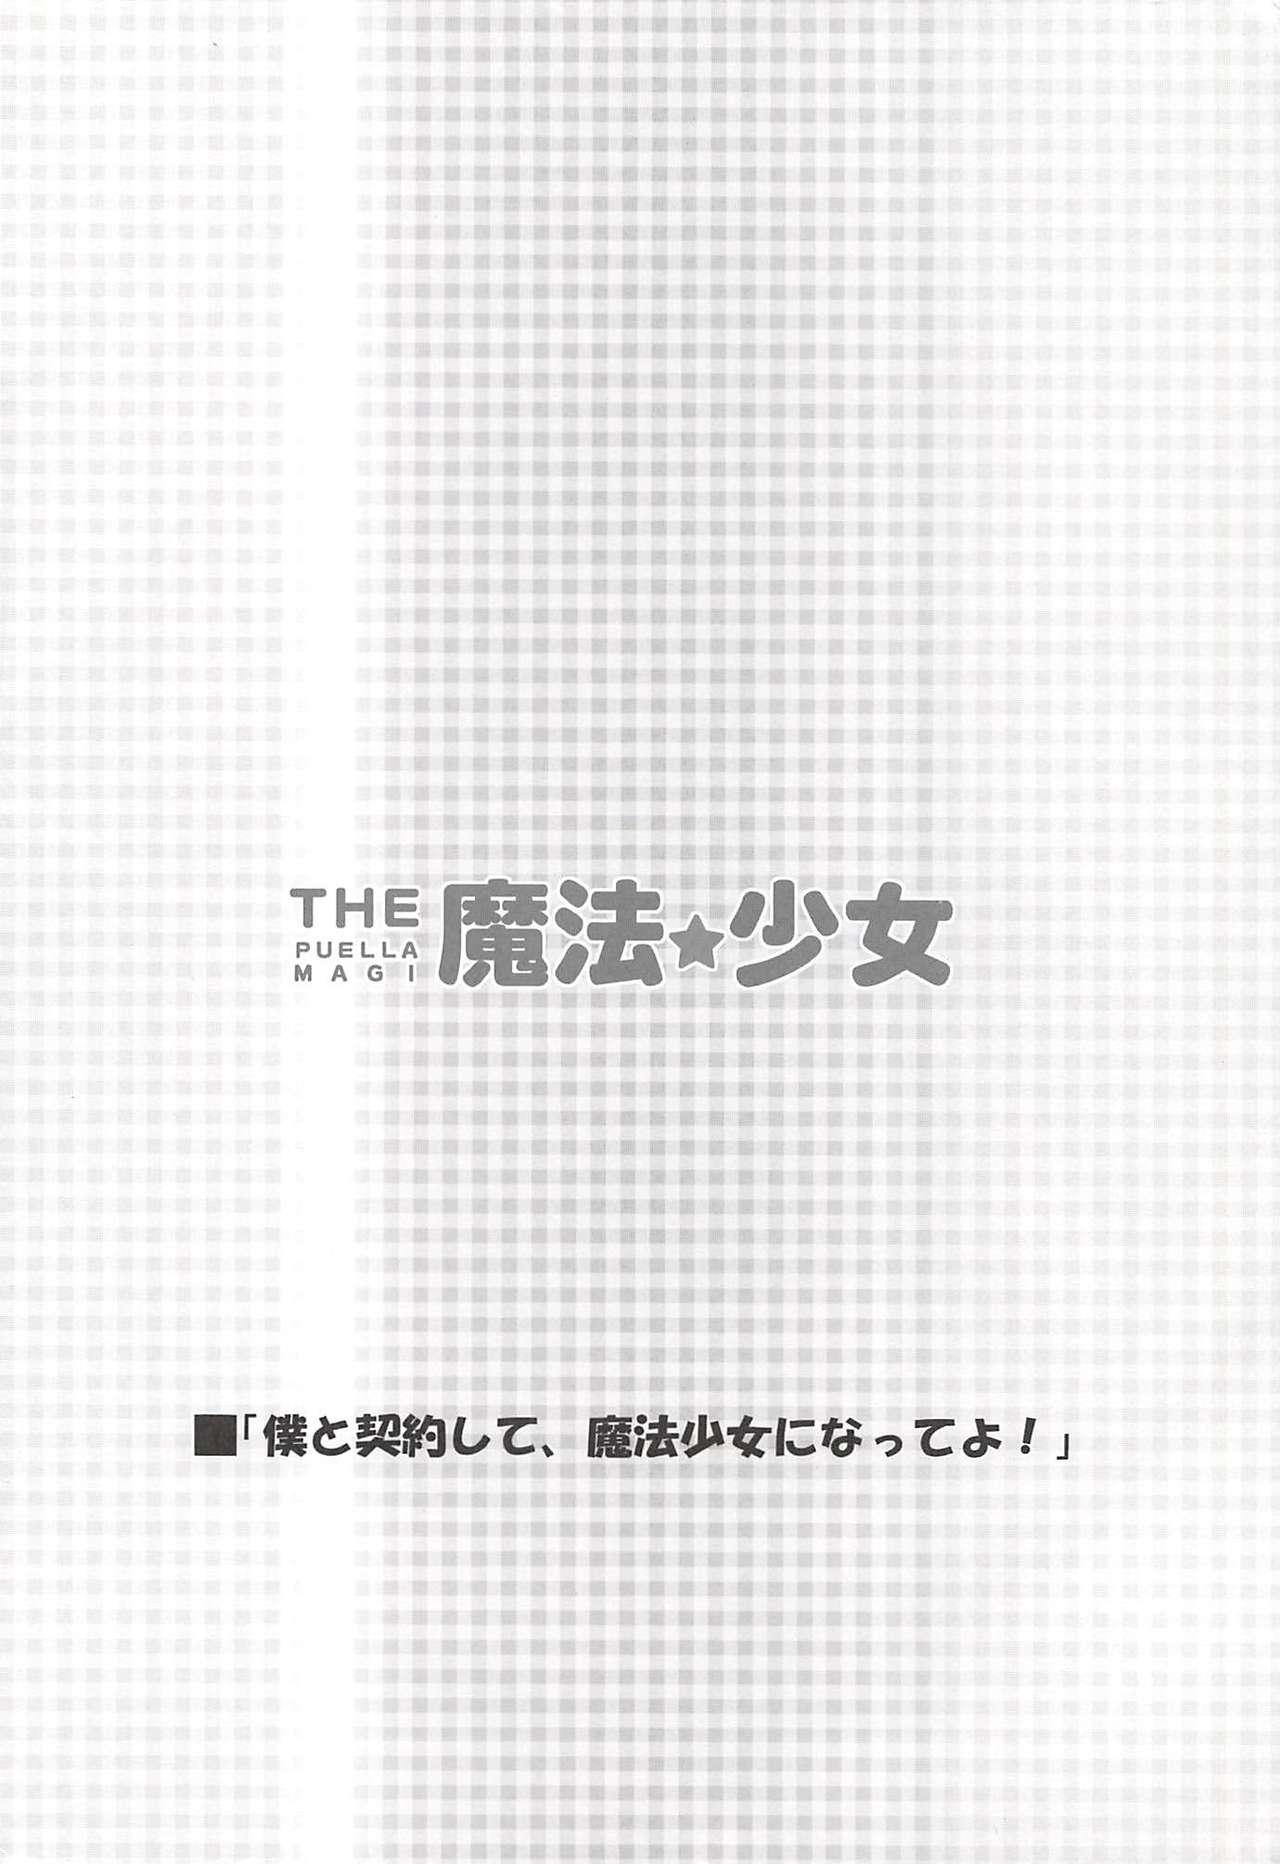 THE Mahou Shoujo 2